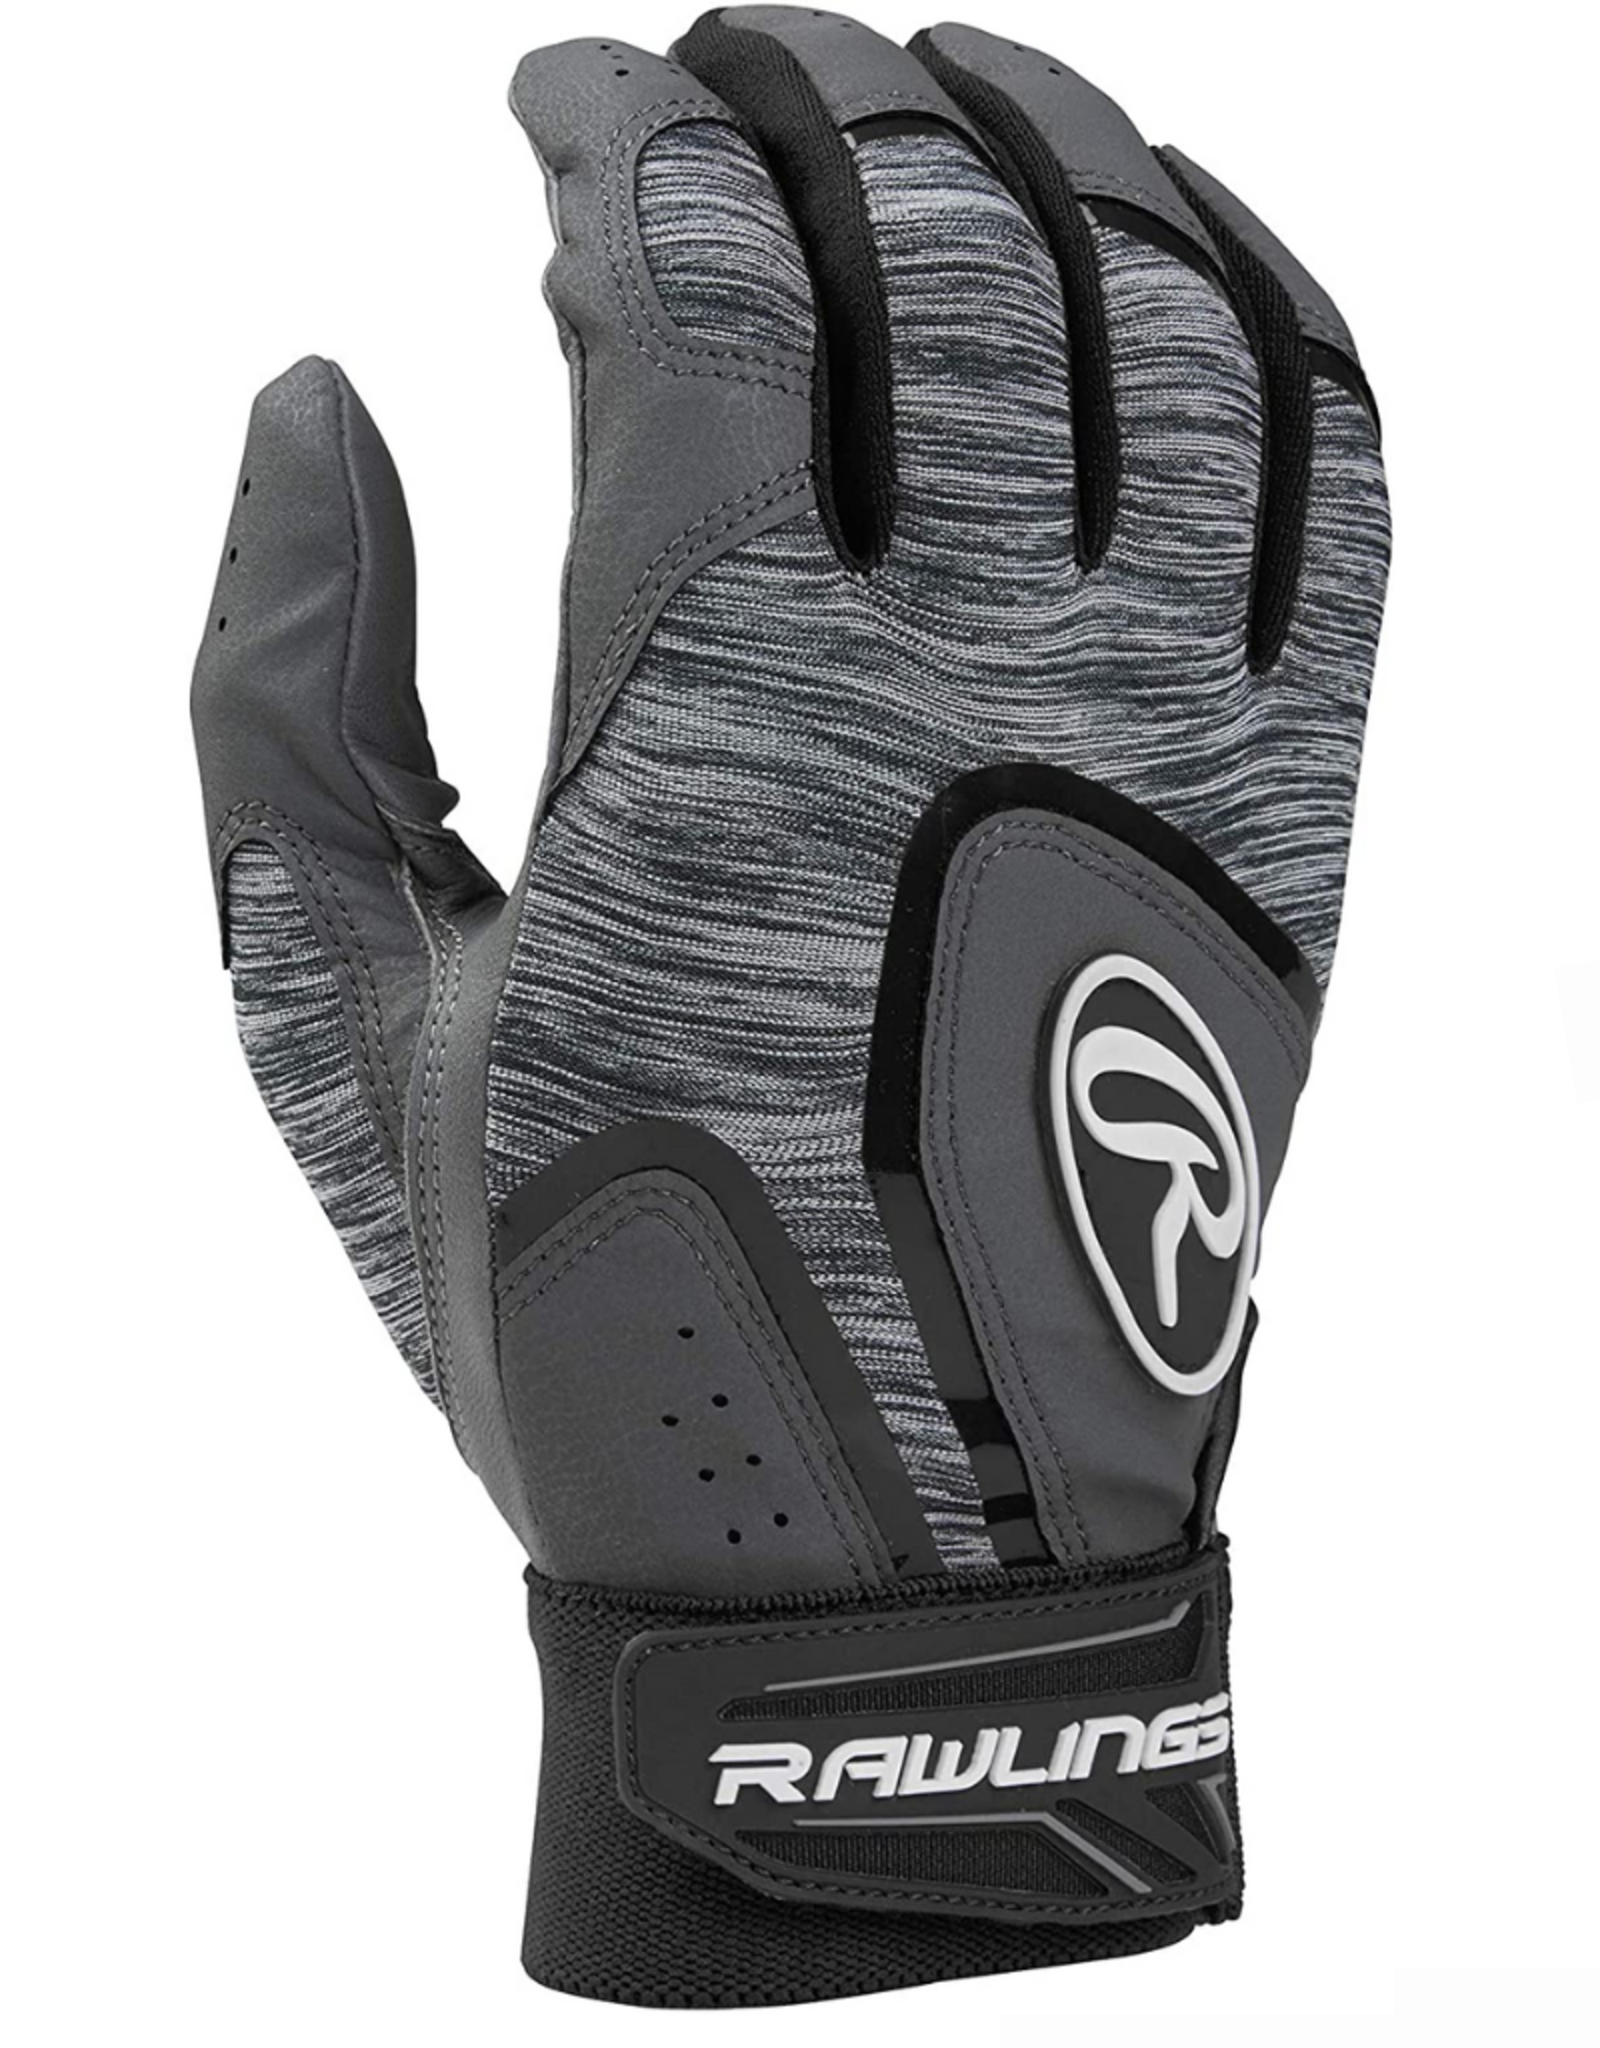 Rawlings Men's 5150 Batting Glove Grey/Black